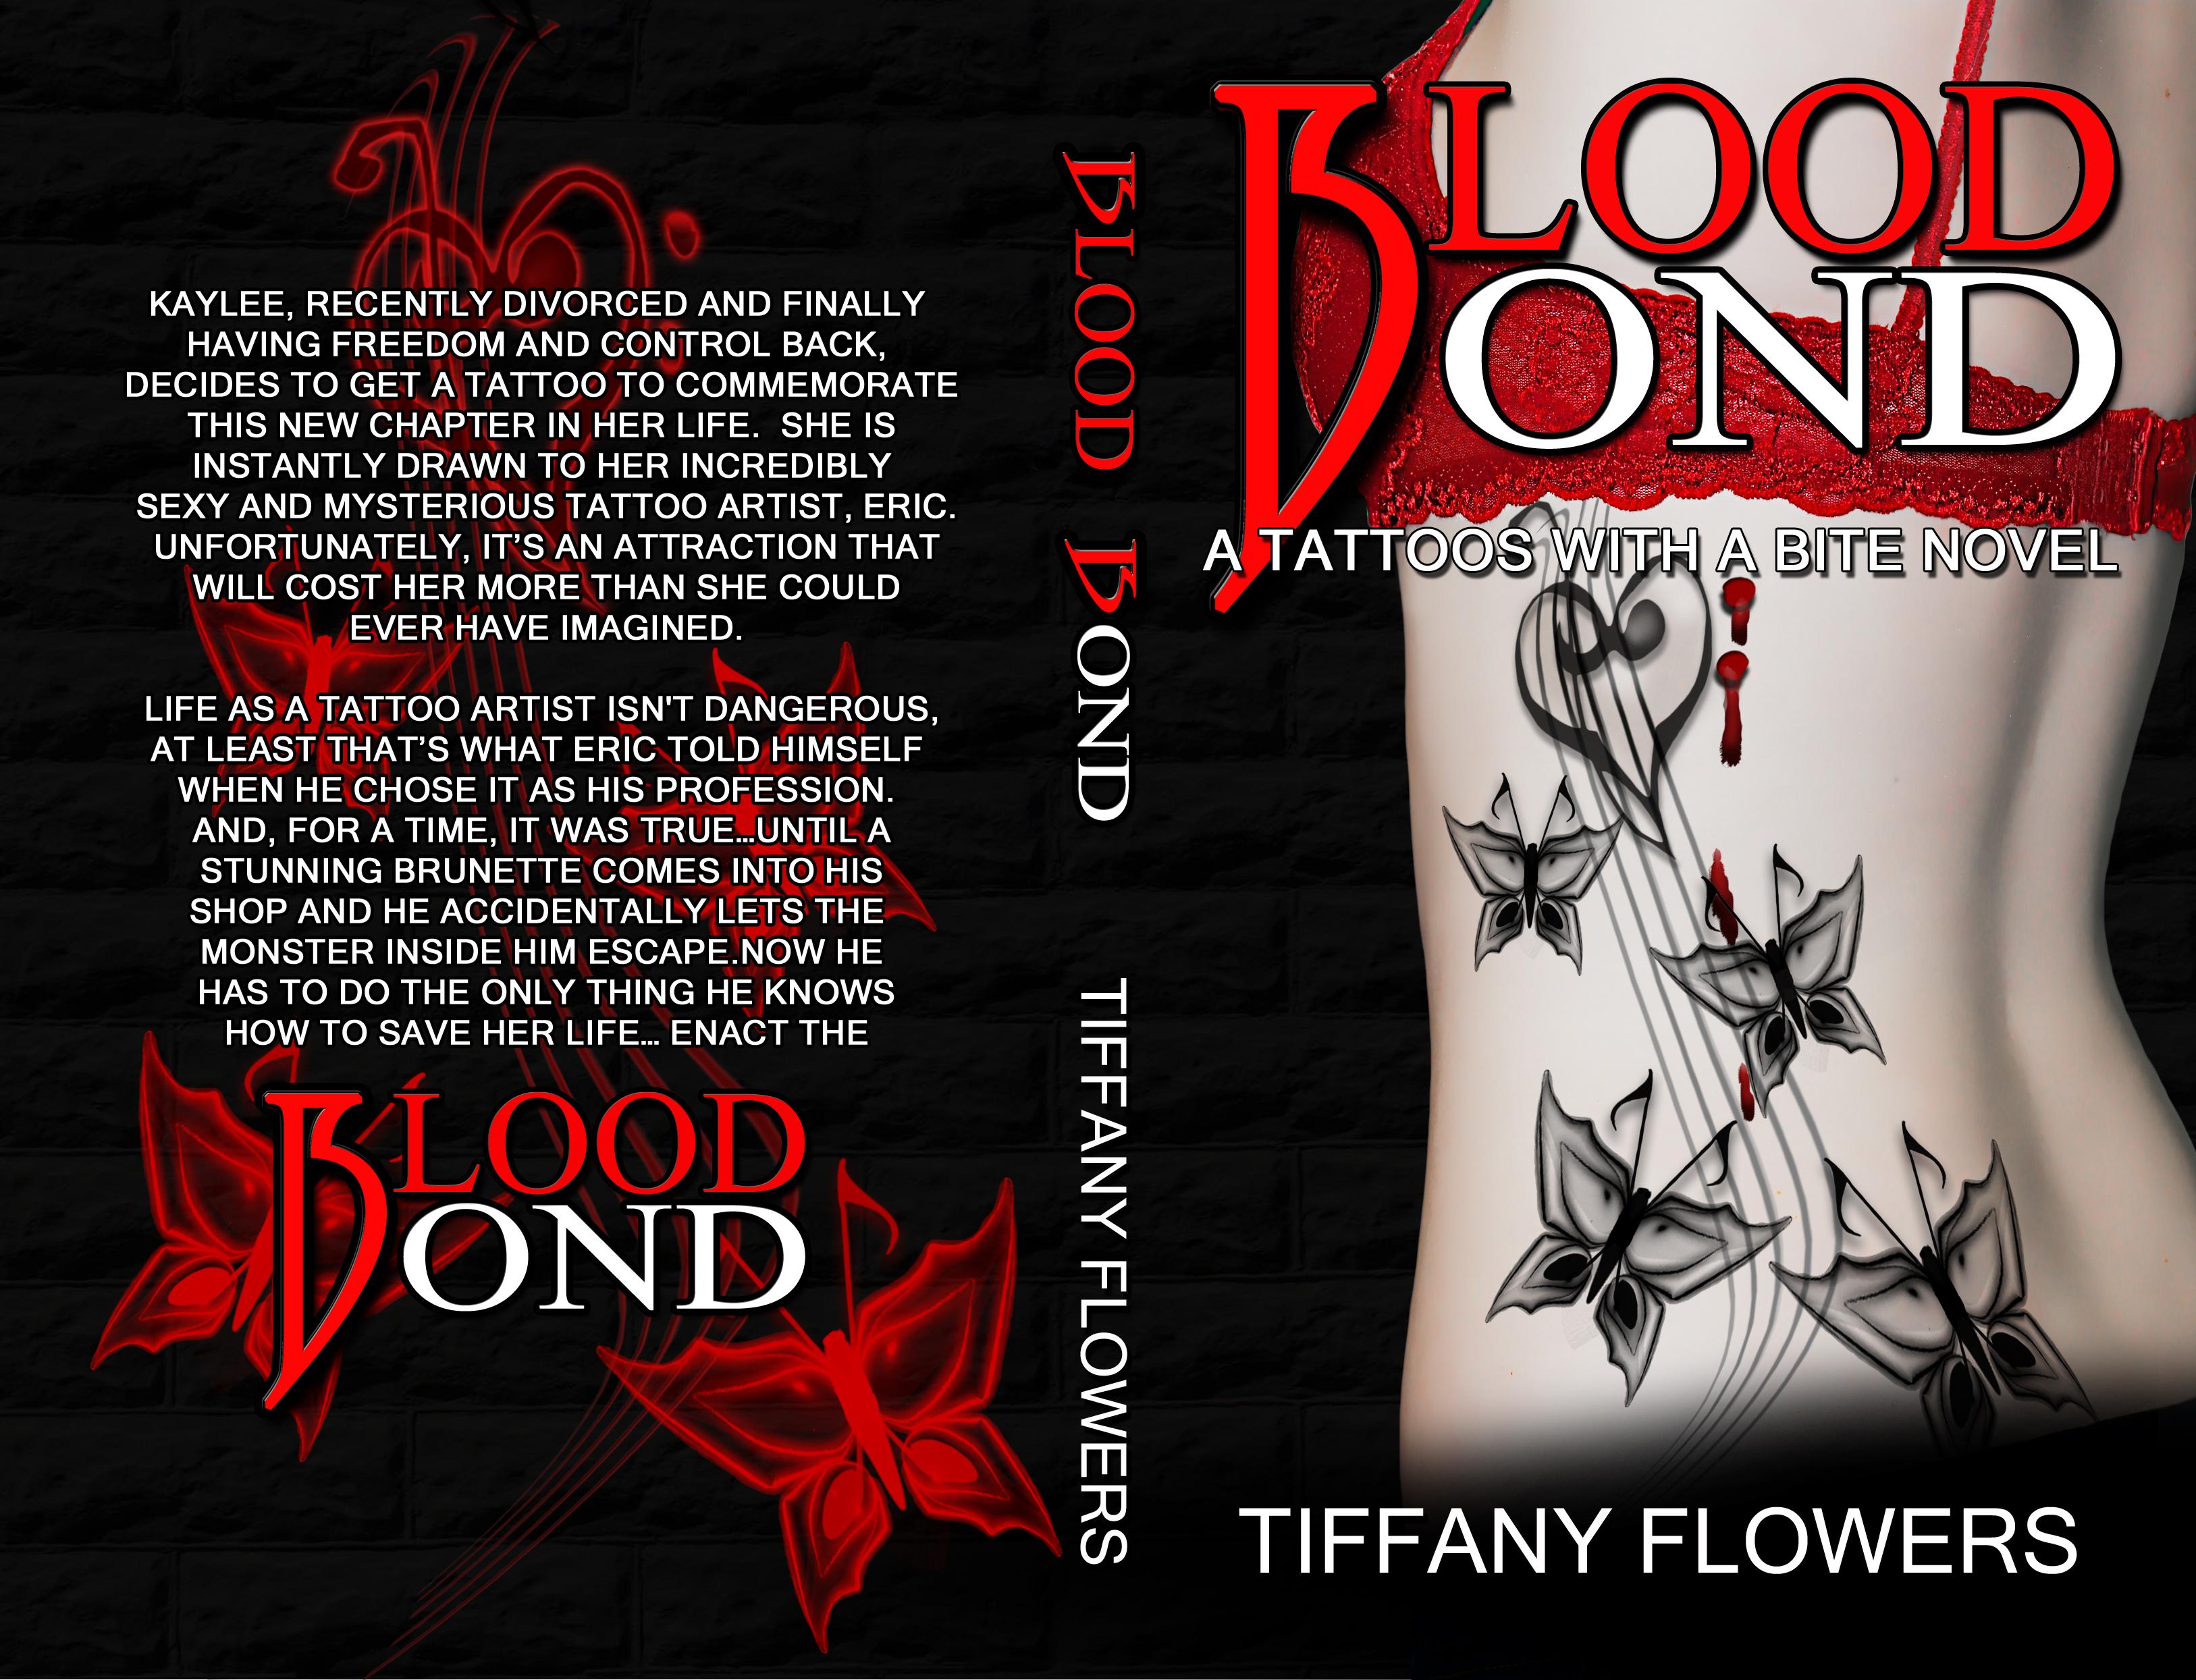 Blood Bond (Tattoos with a Bite #1) Tiffany Flowers